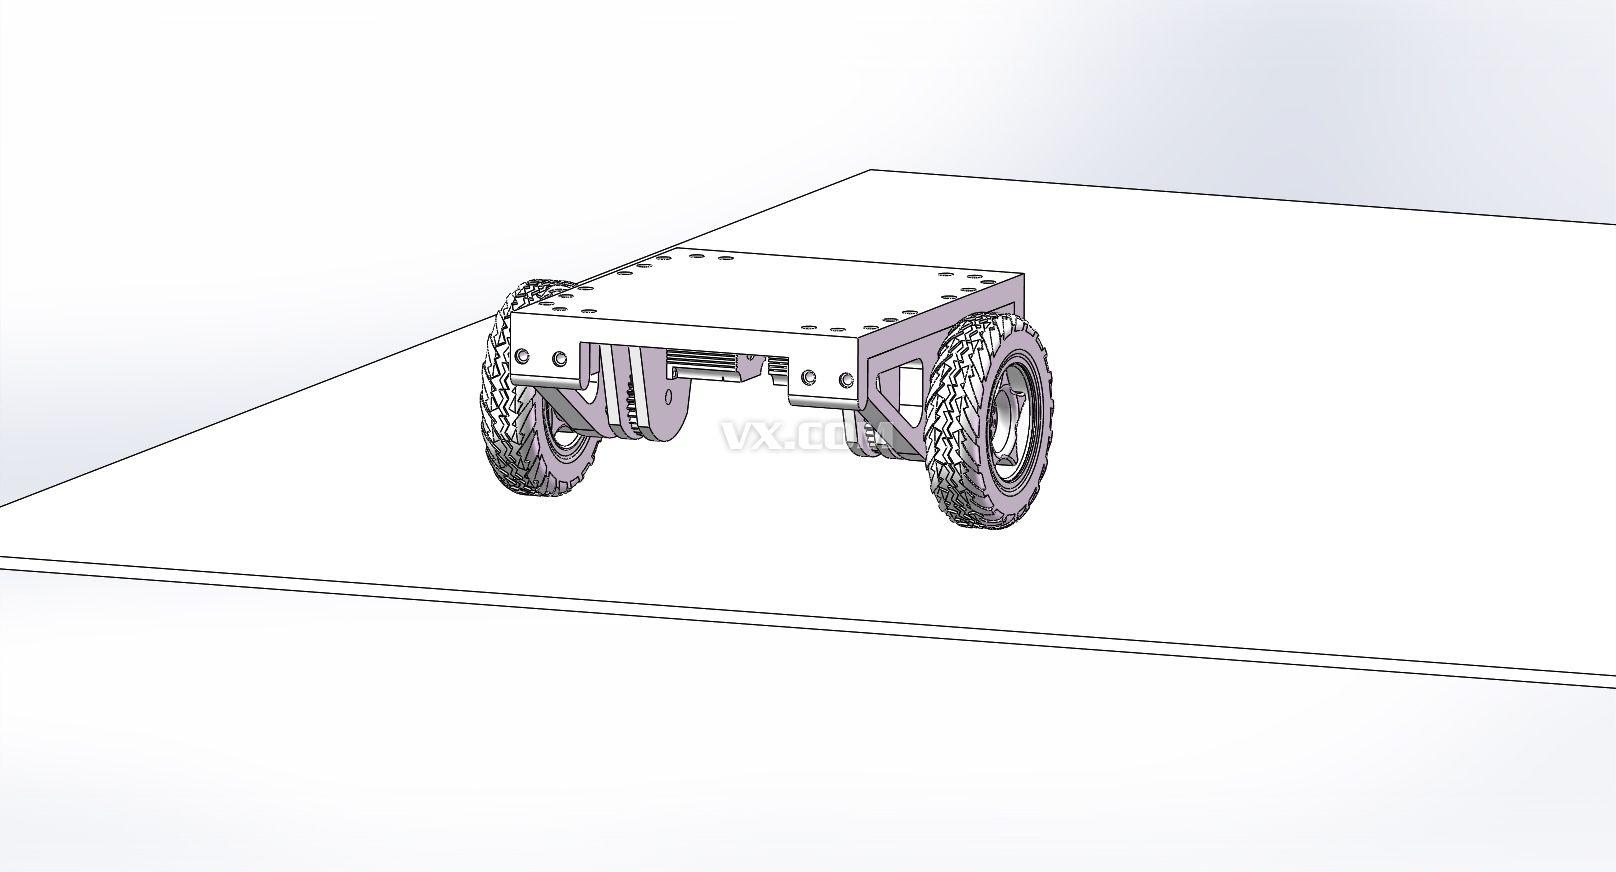 两轮自平衡小车silidworks设计